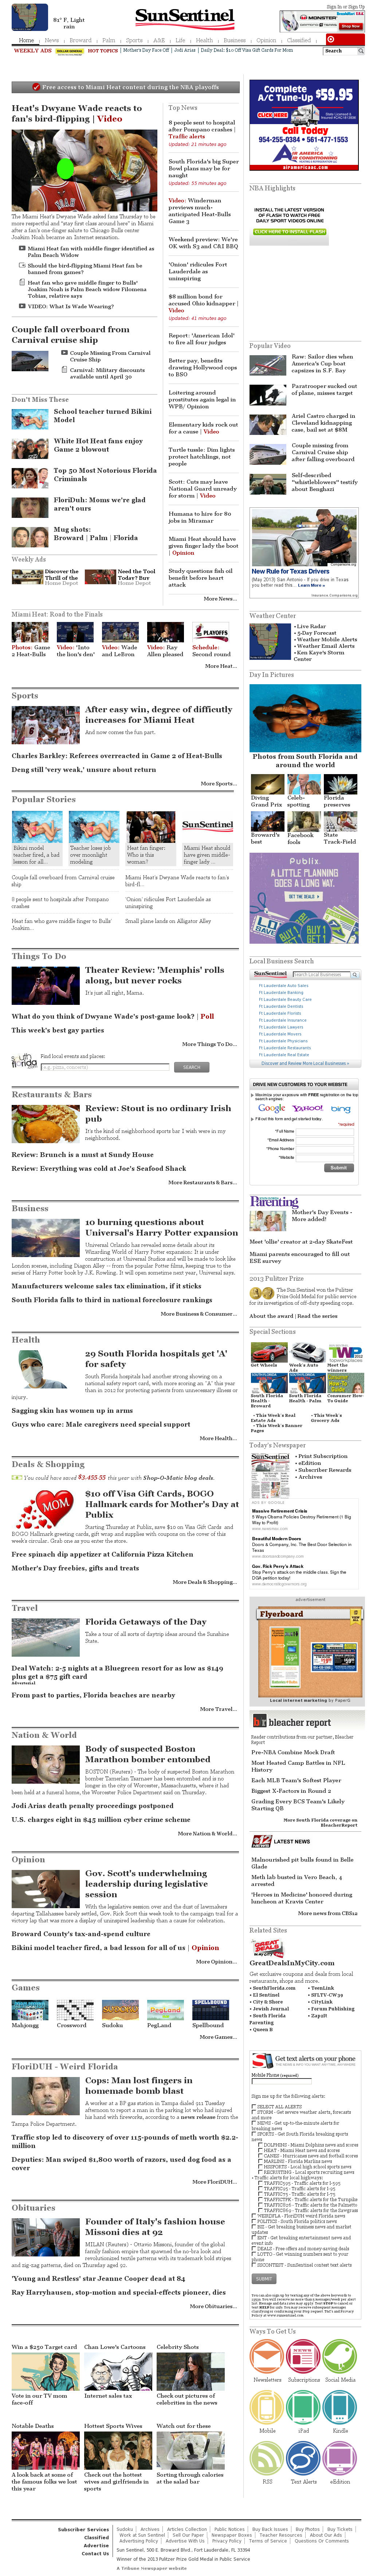 (Florida) Sun Sentinel at Thursday May 9, 2013, 10:47 p.m. UTC